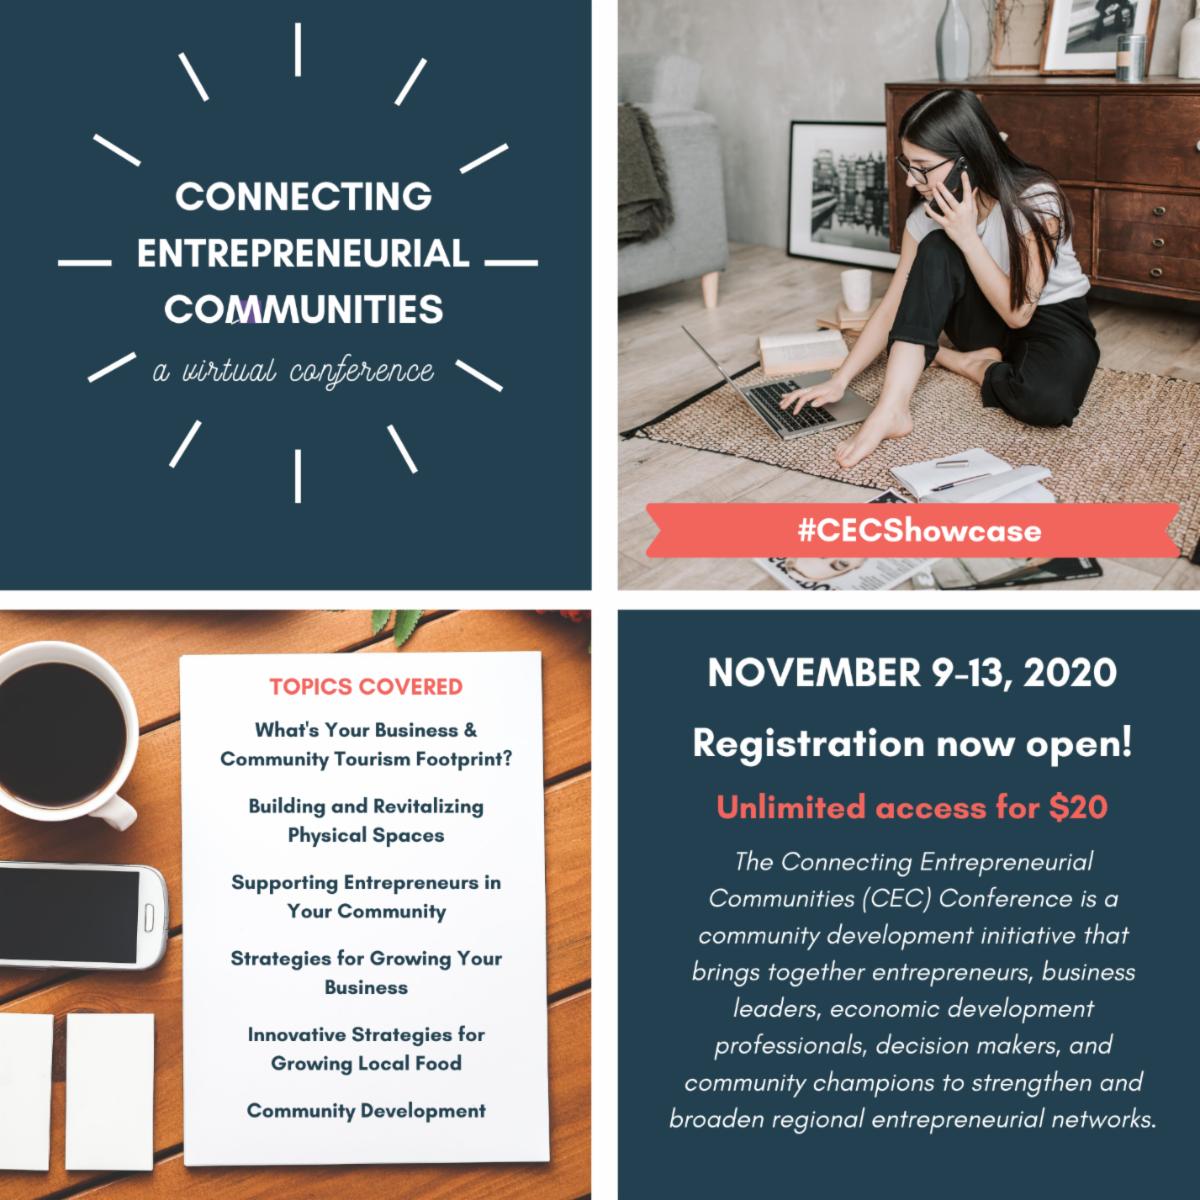 Entrepreneur conference Nov 2020